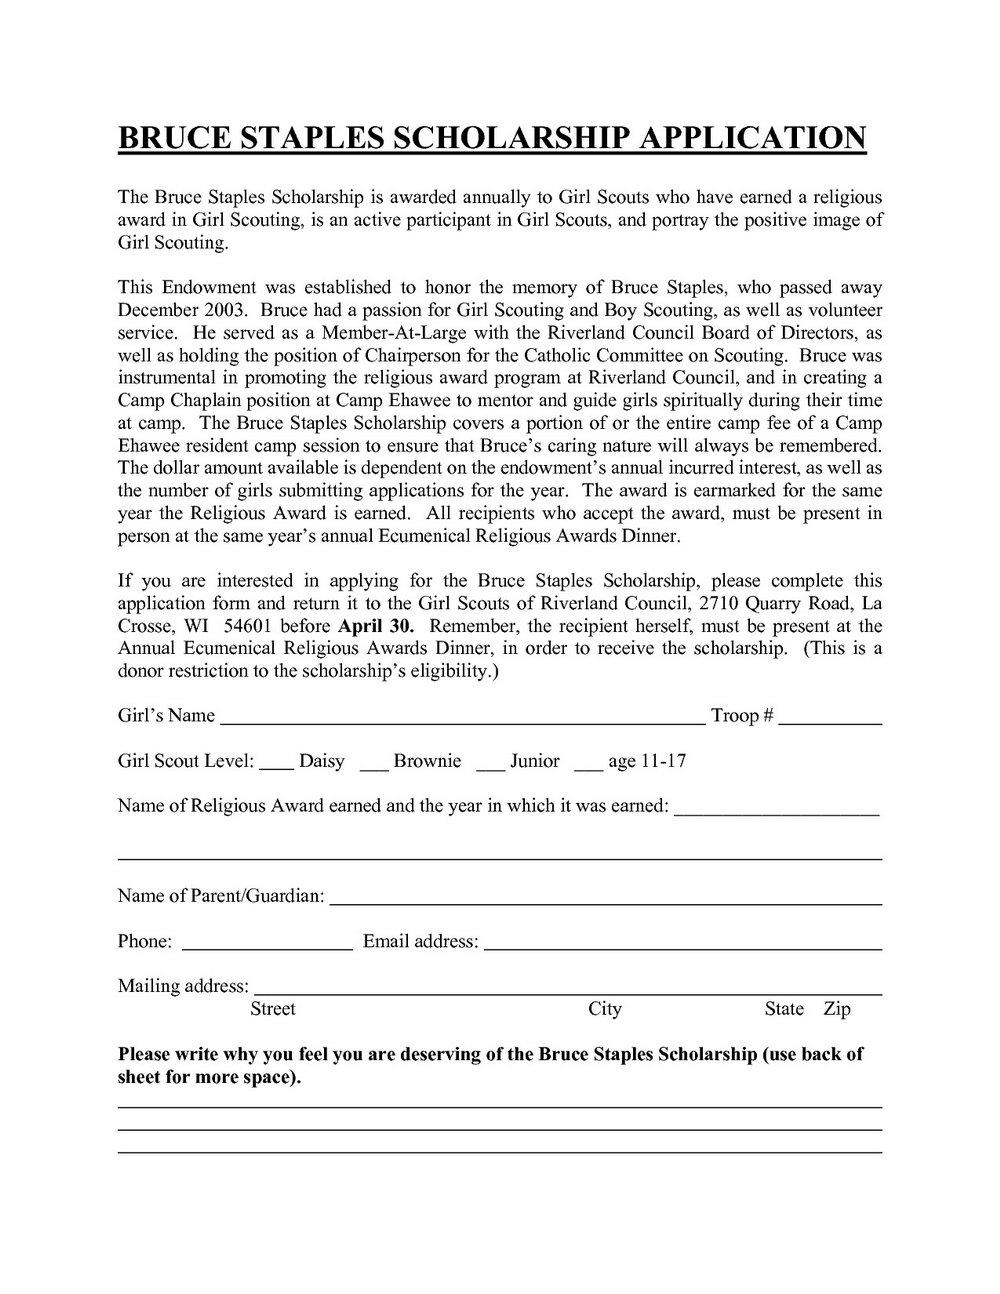 Https Jobs.kroger.com Application